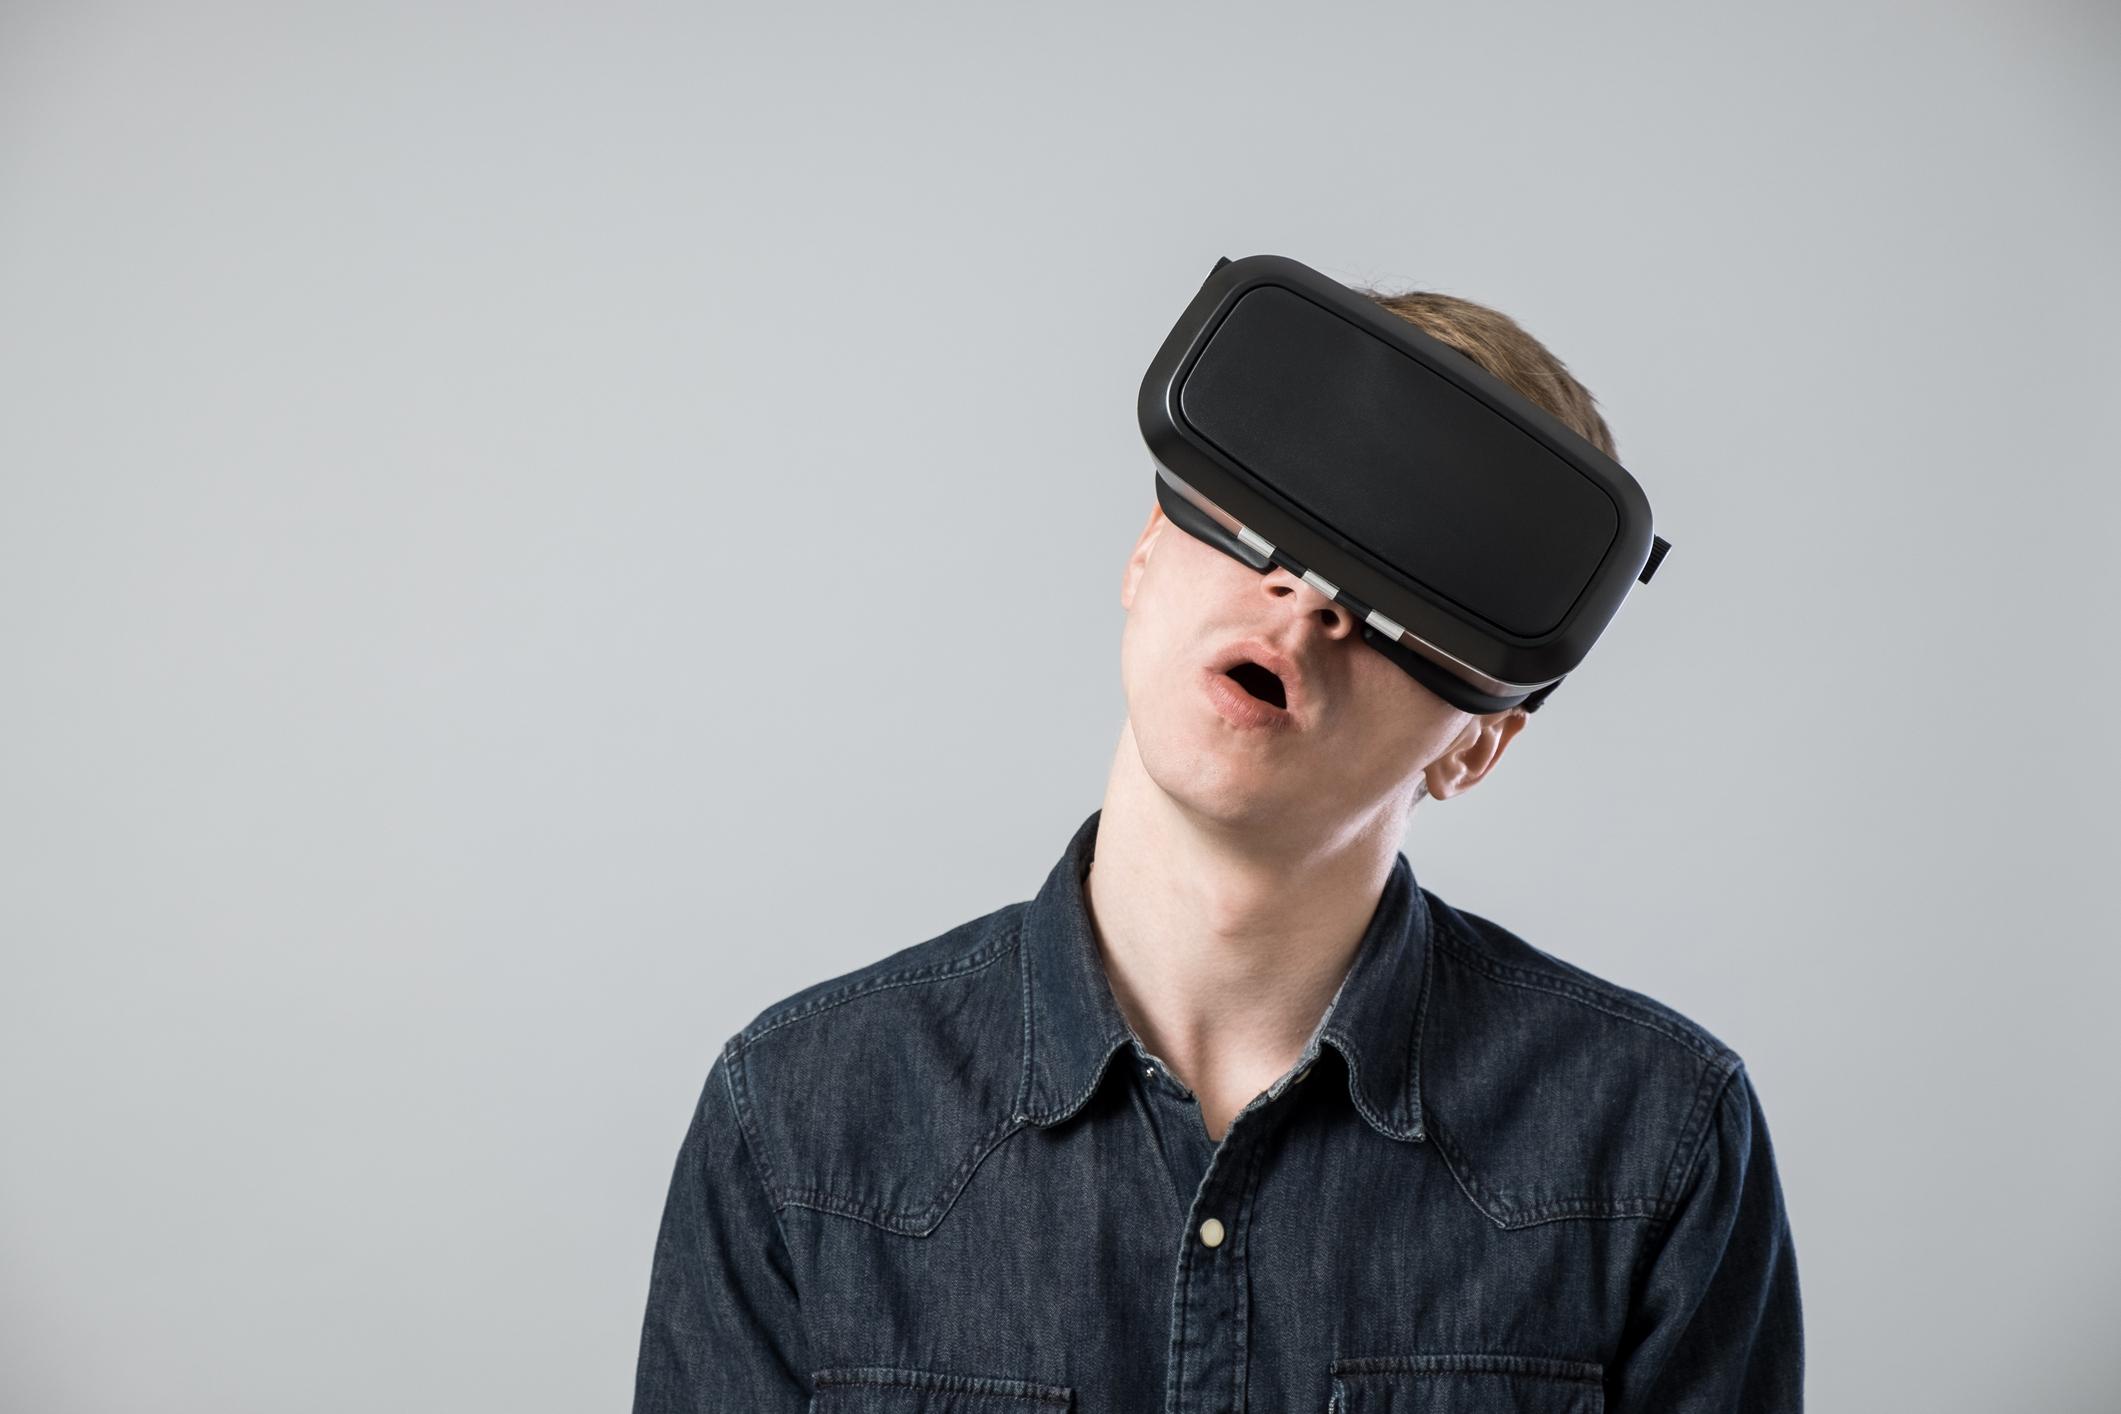 Flustered-GameReef-VR-User.jpg